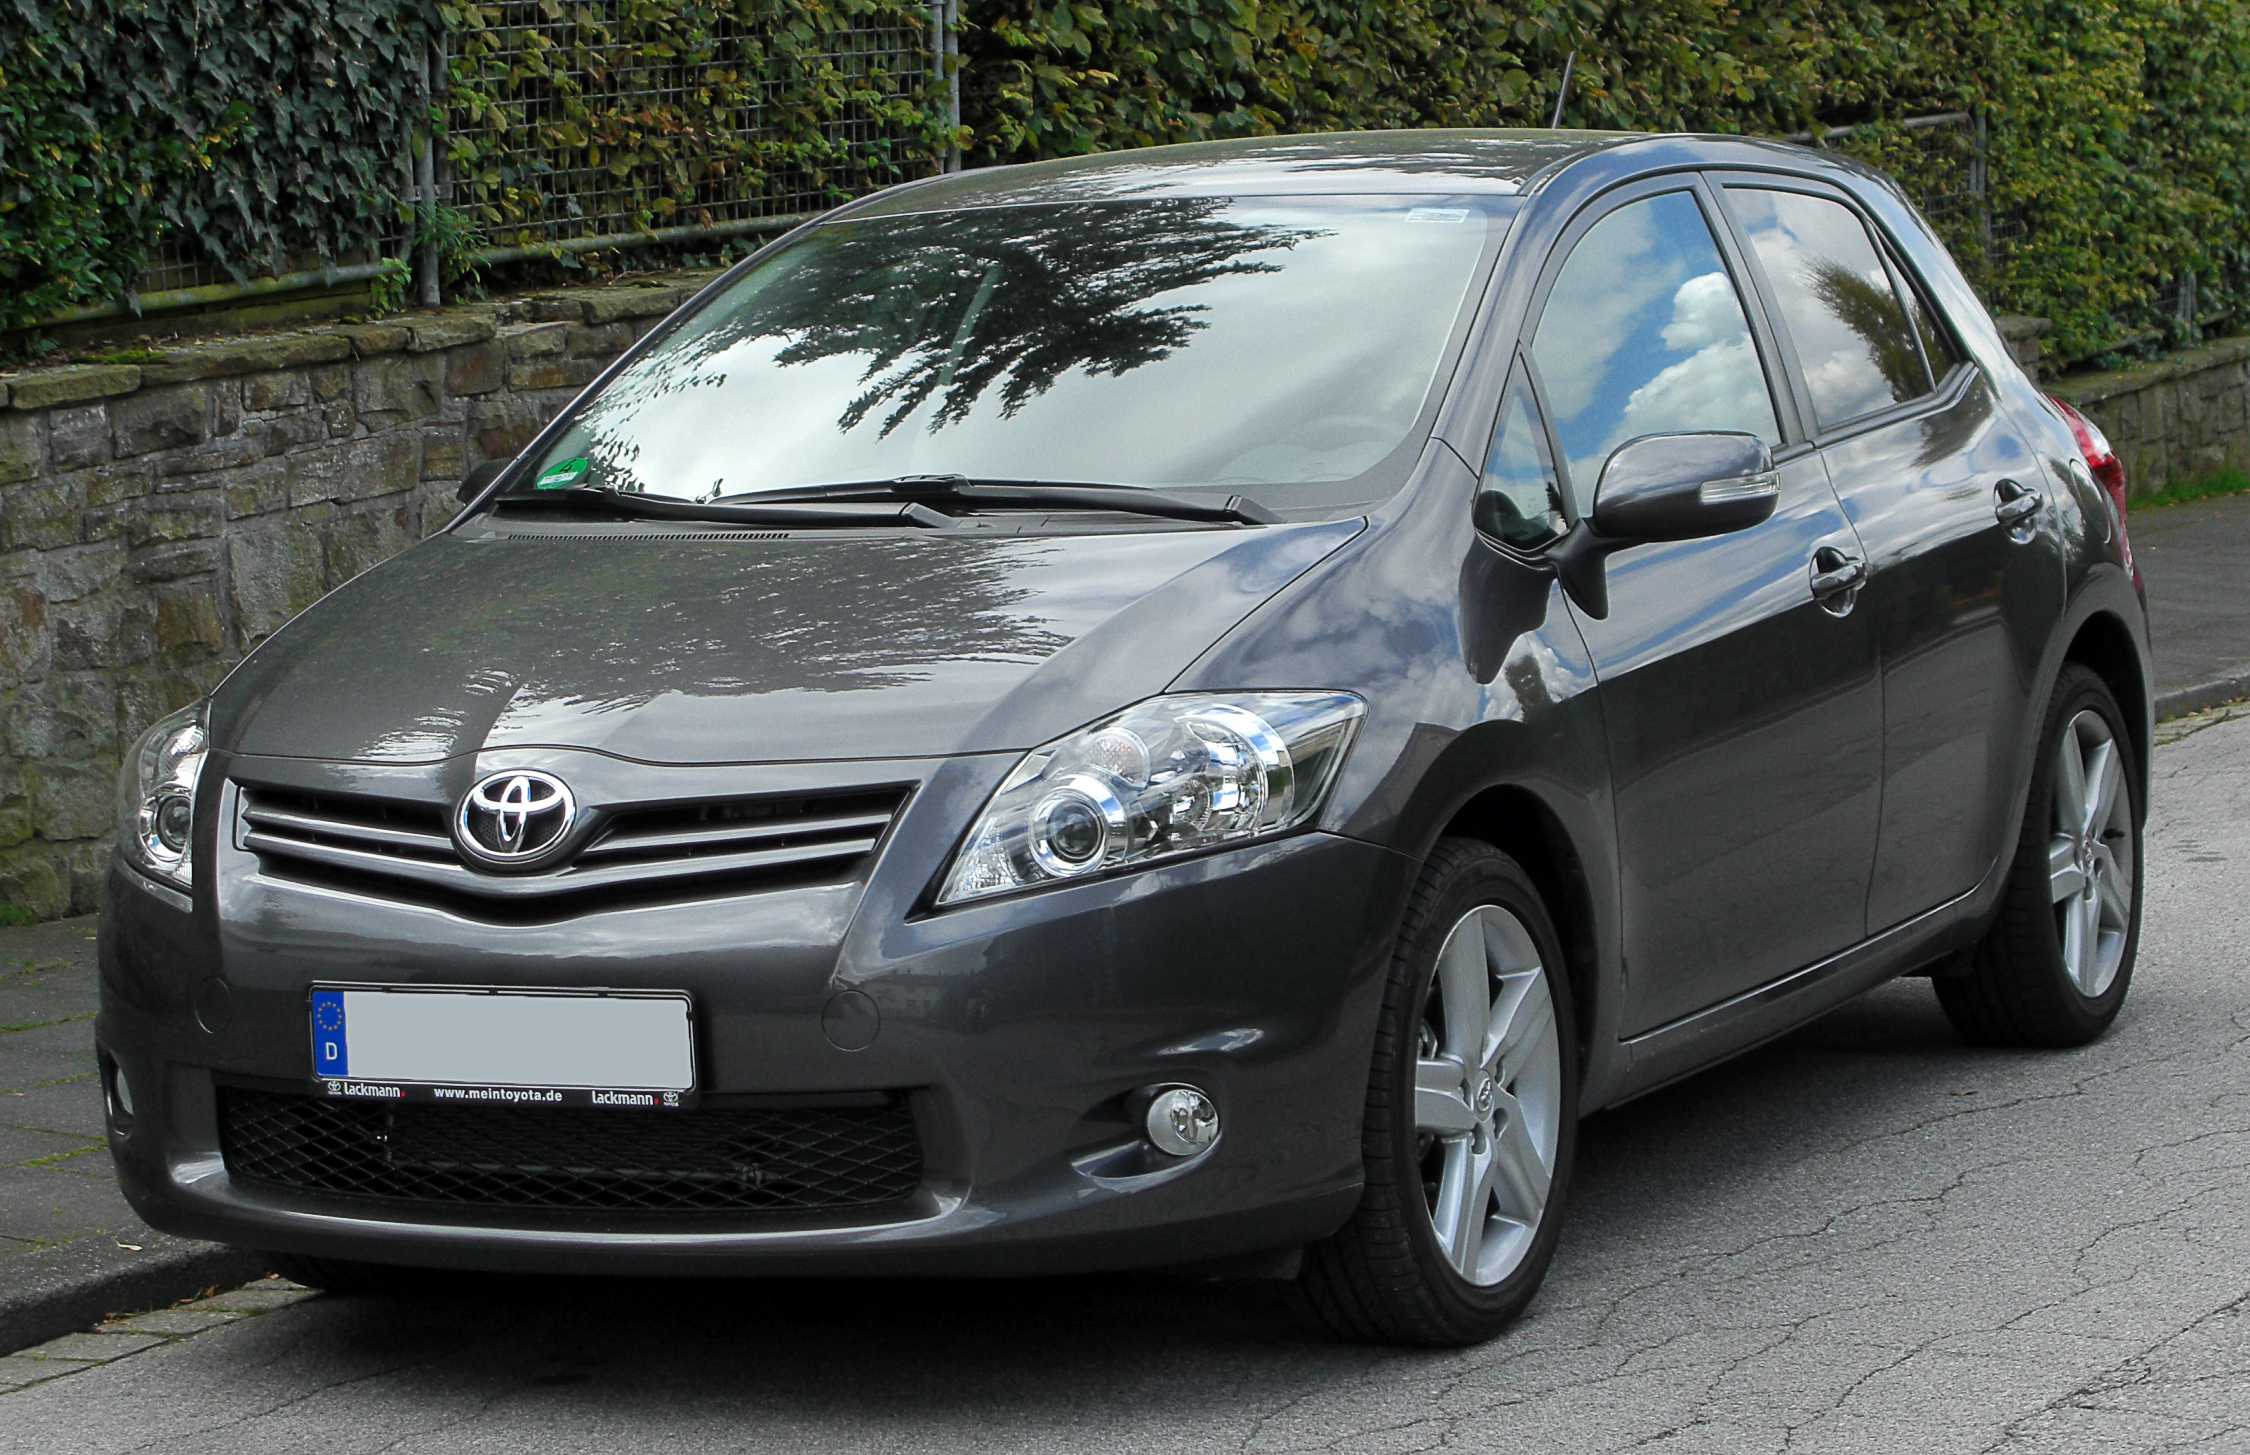 Toyota Modelleri 2014